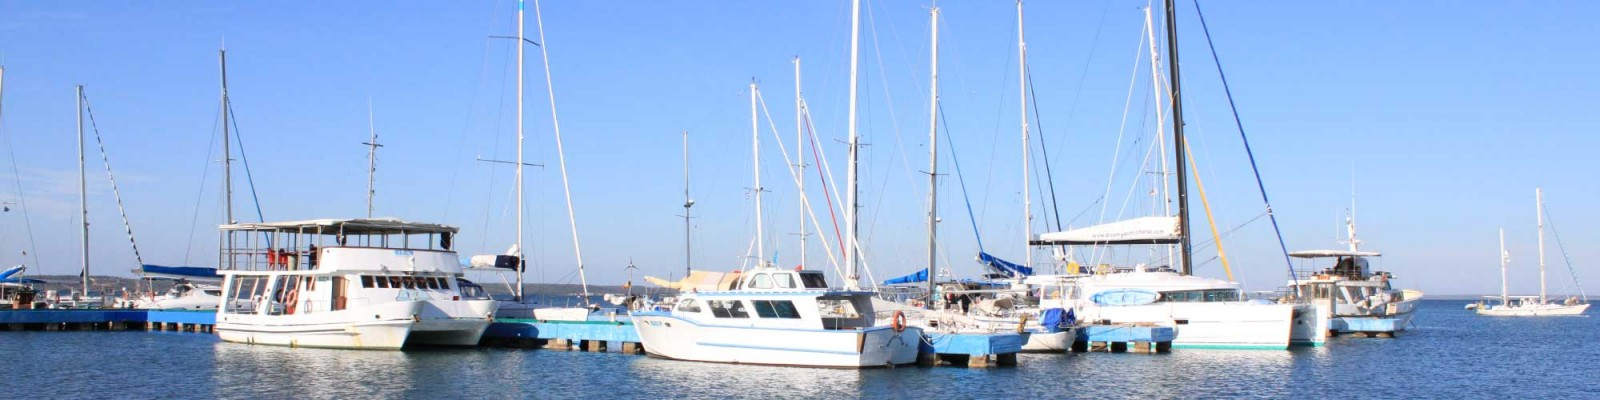 Tenrag Yacht Charter: Cuba